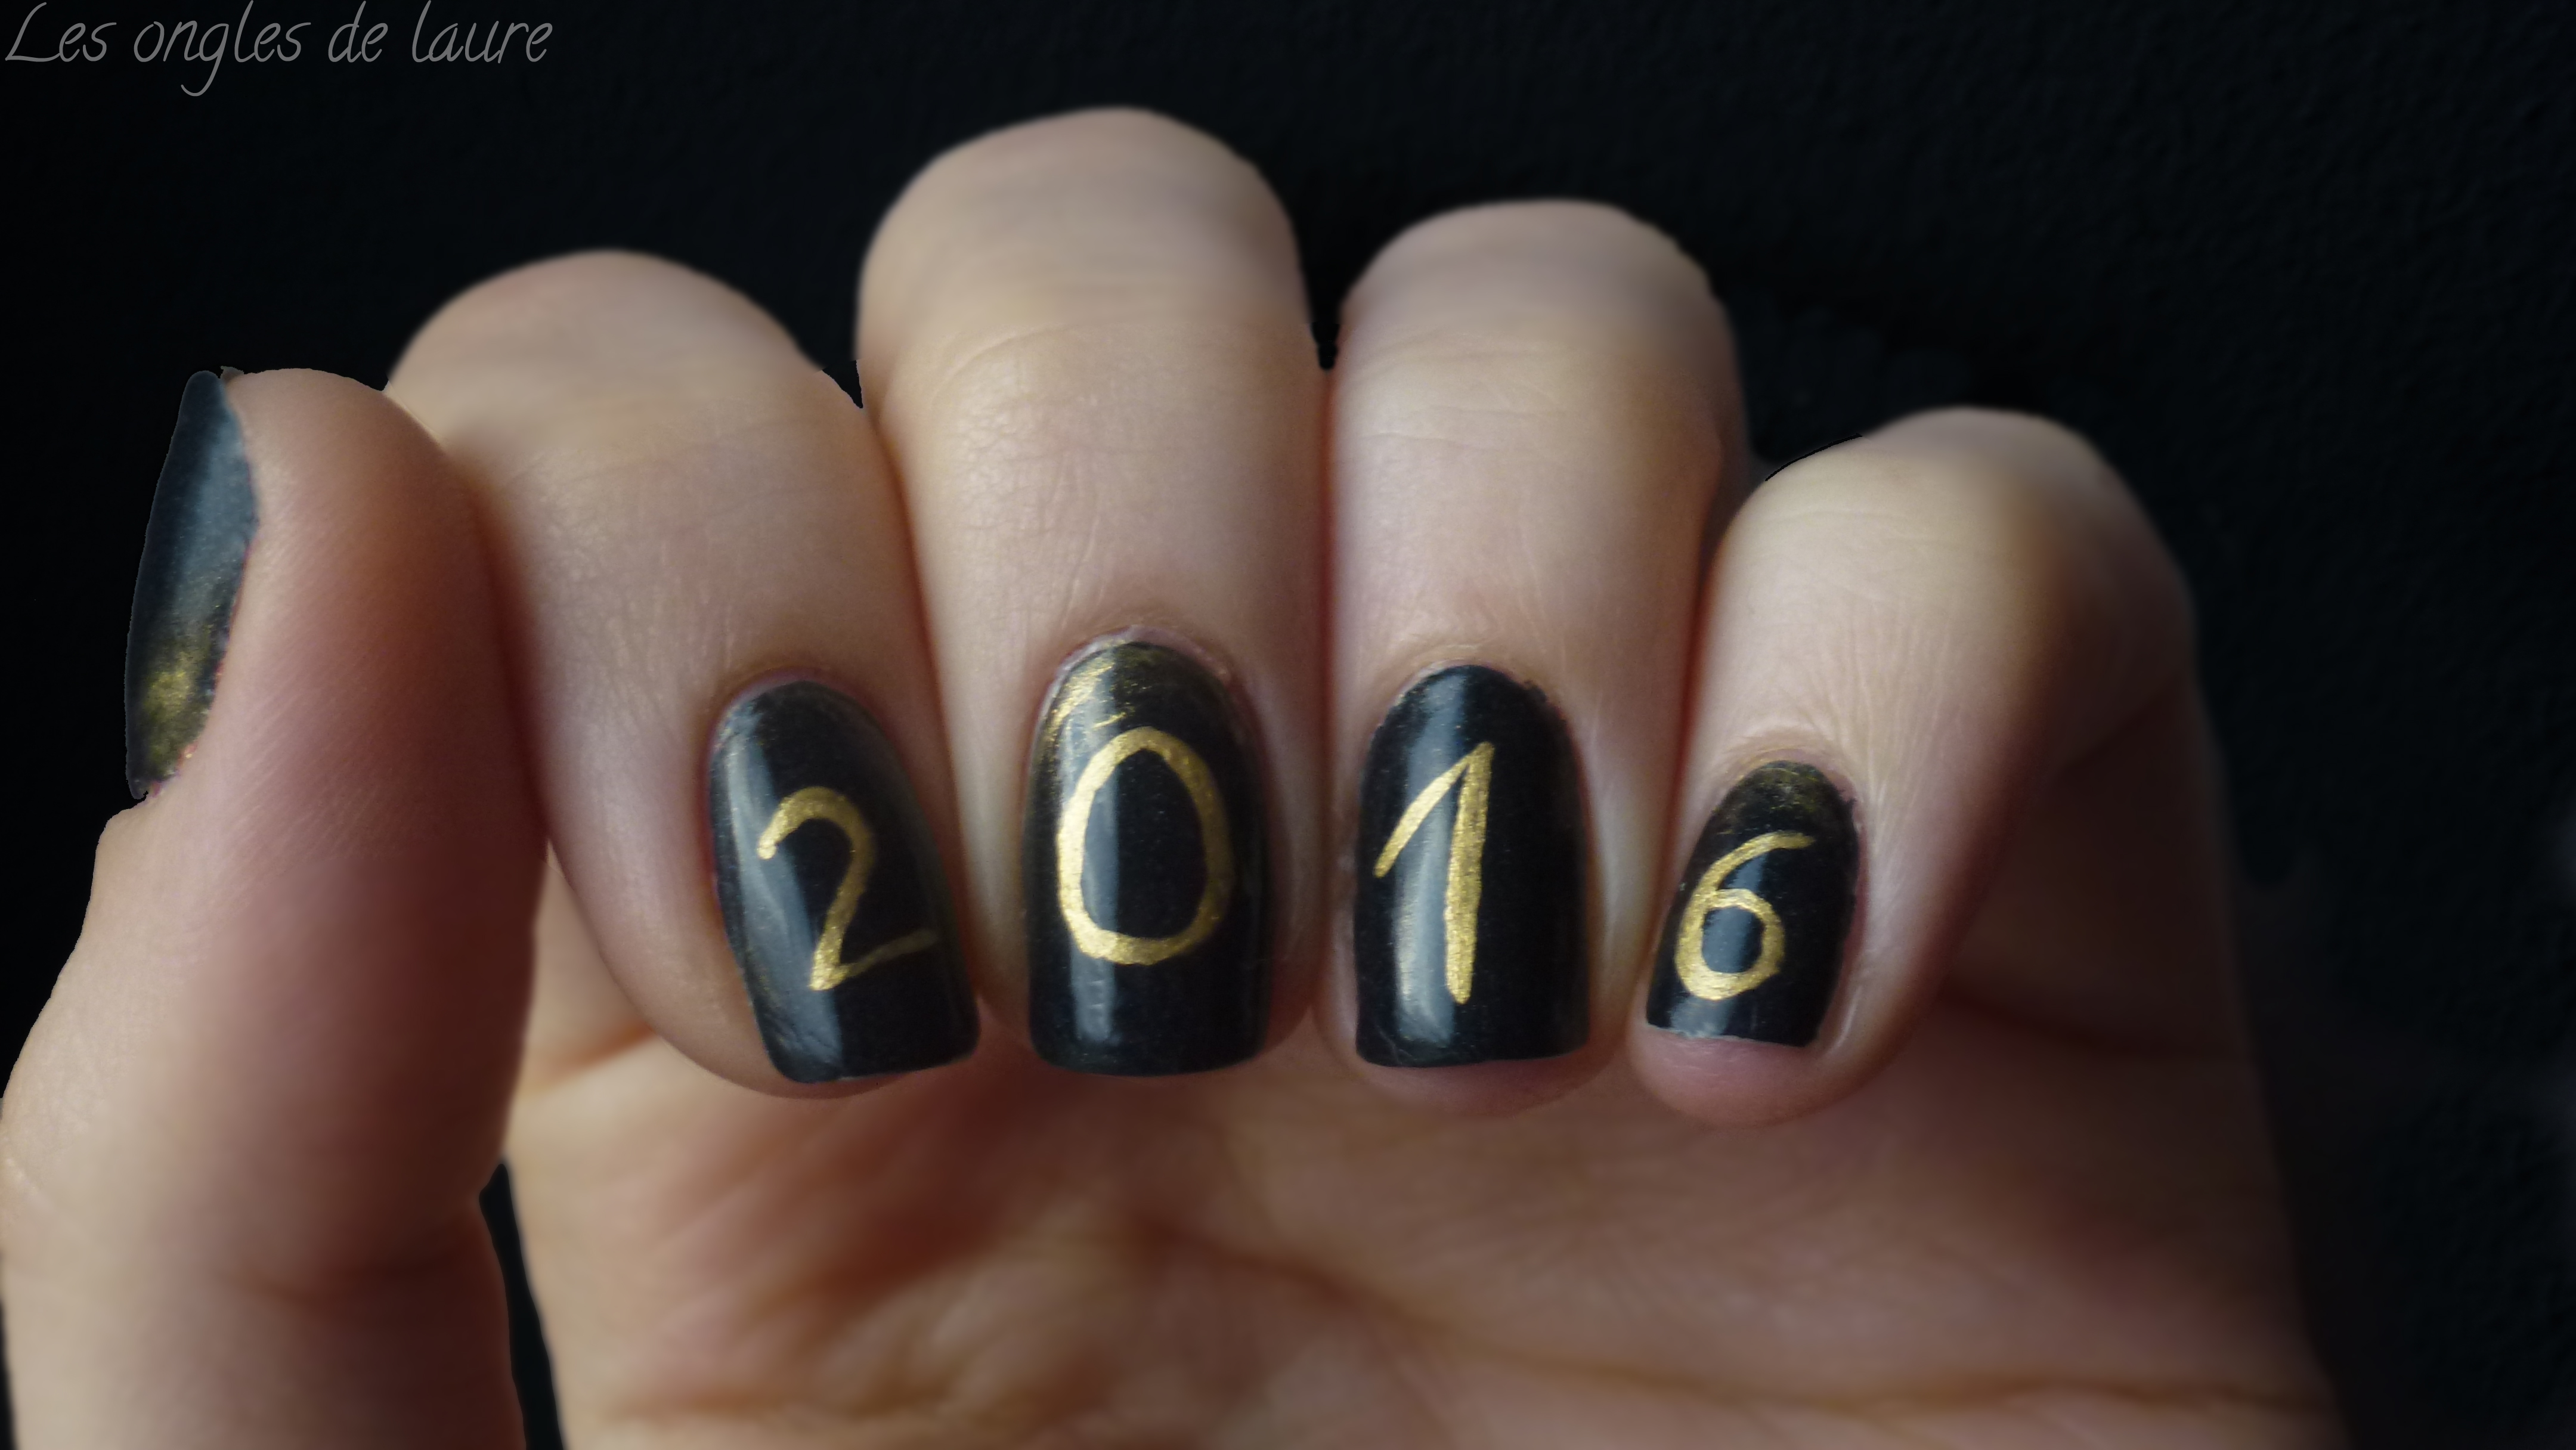 Unhas Criativas Ano novoUnhas Criativas Ano novo